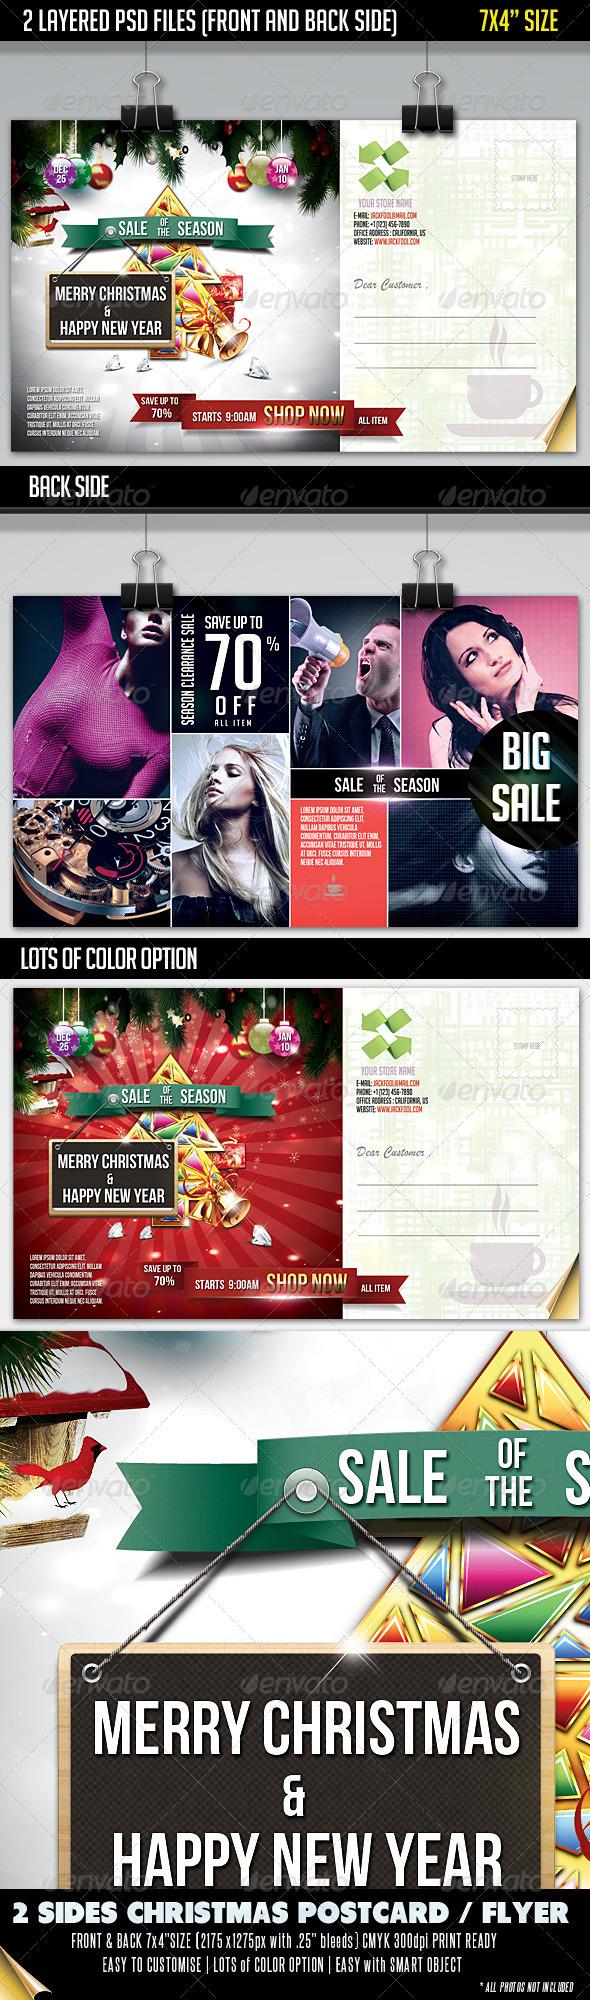 GraphicRiver Christmas Sale Postcard-Front & Back 3375504